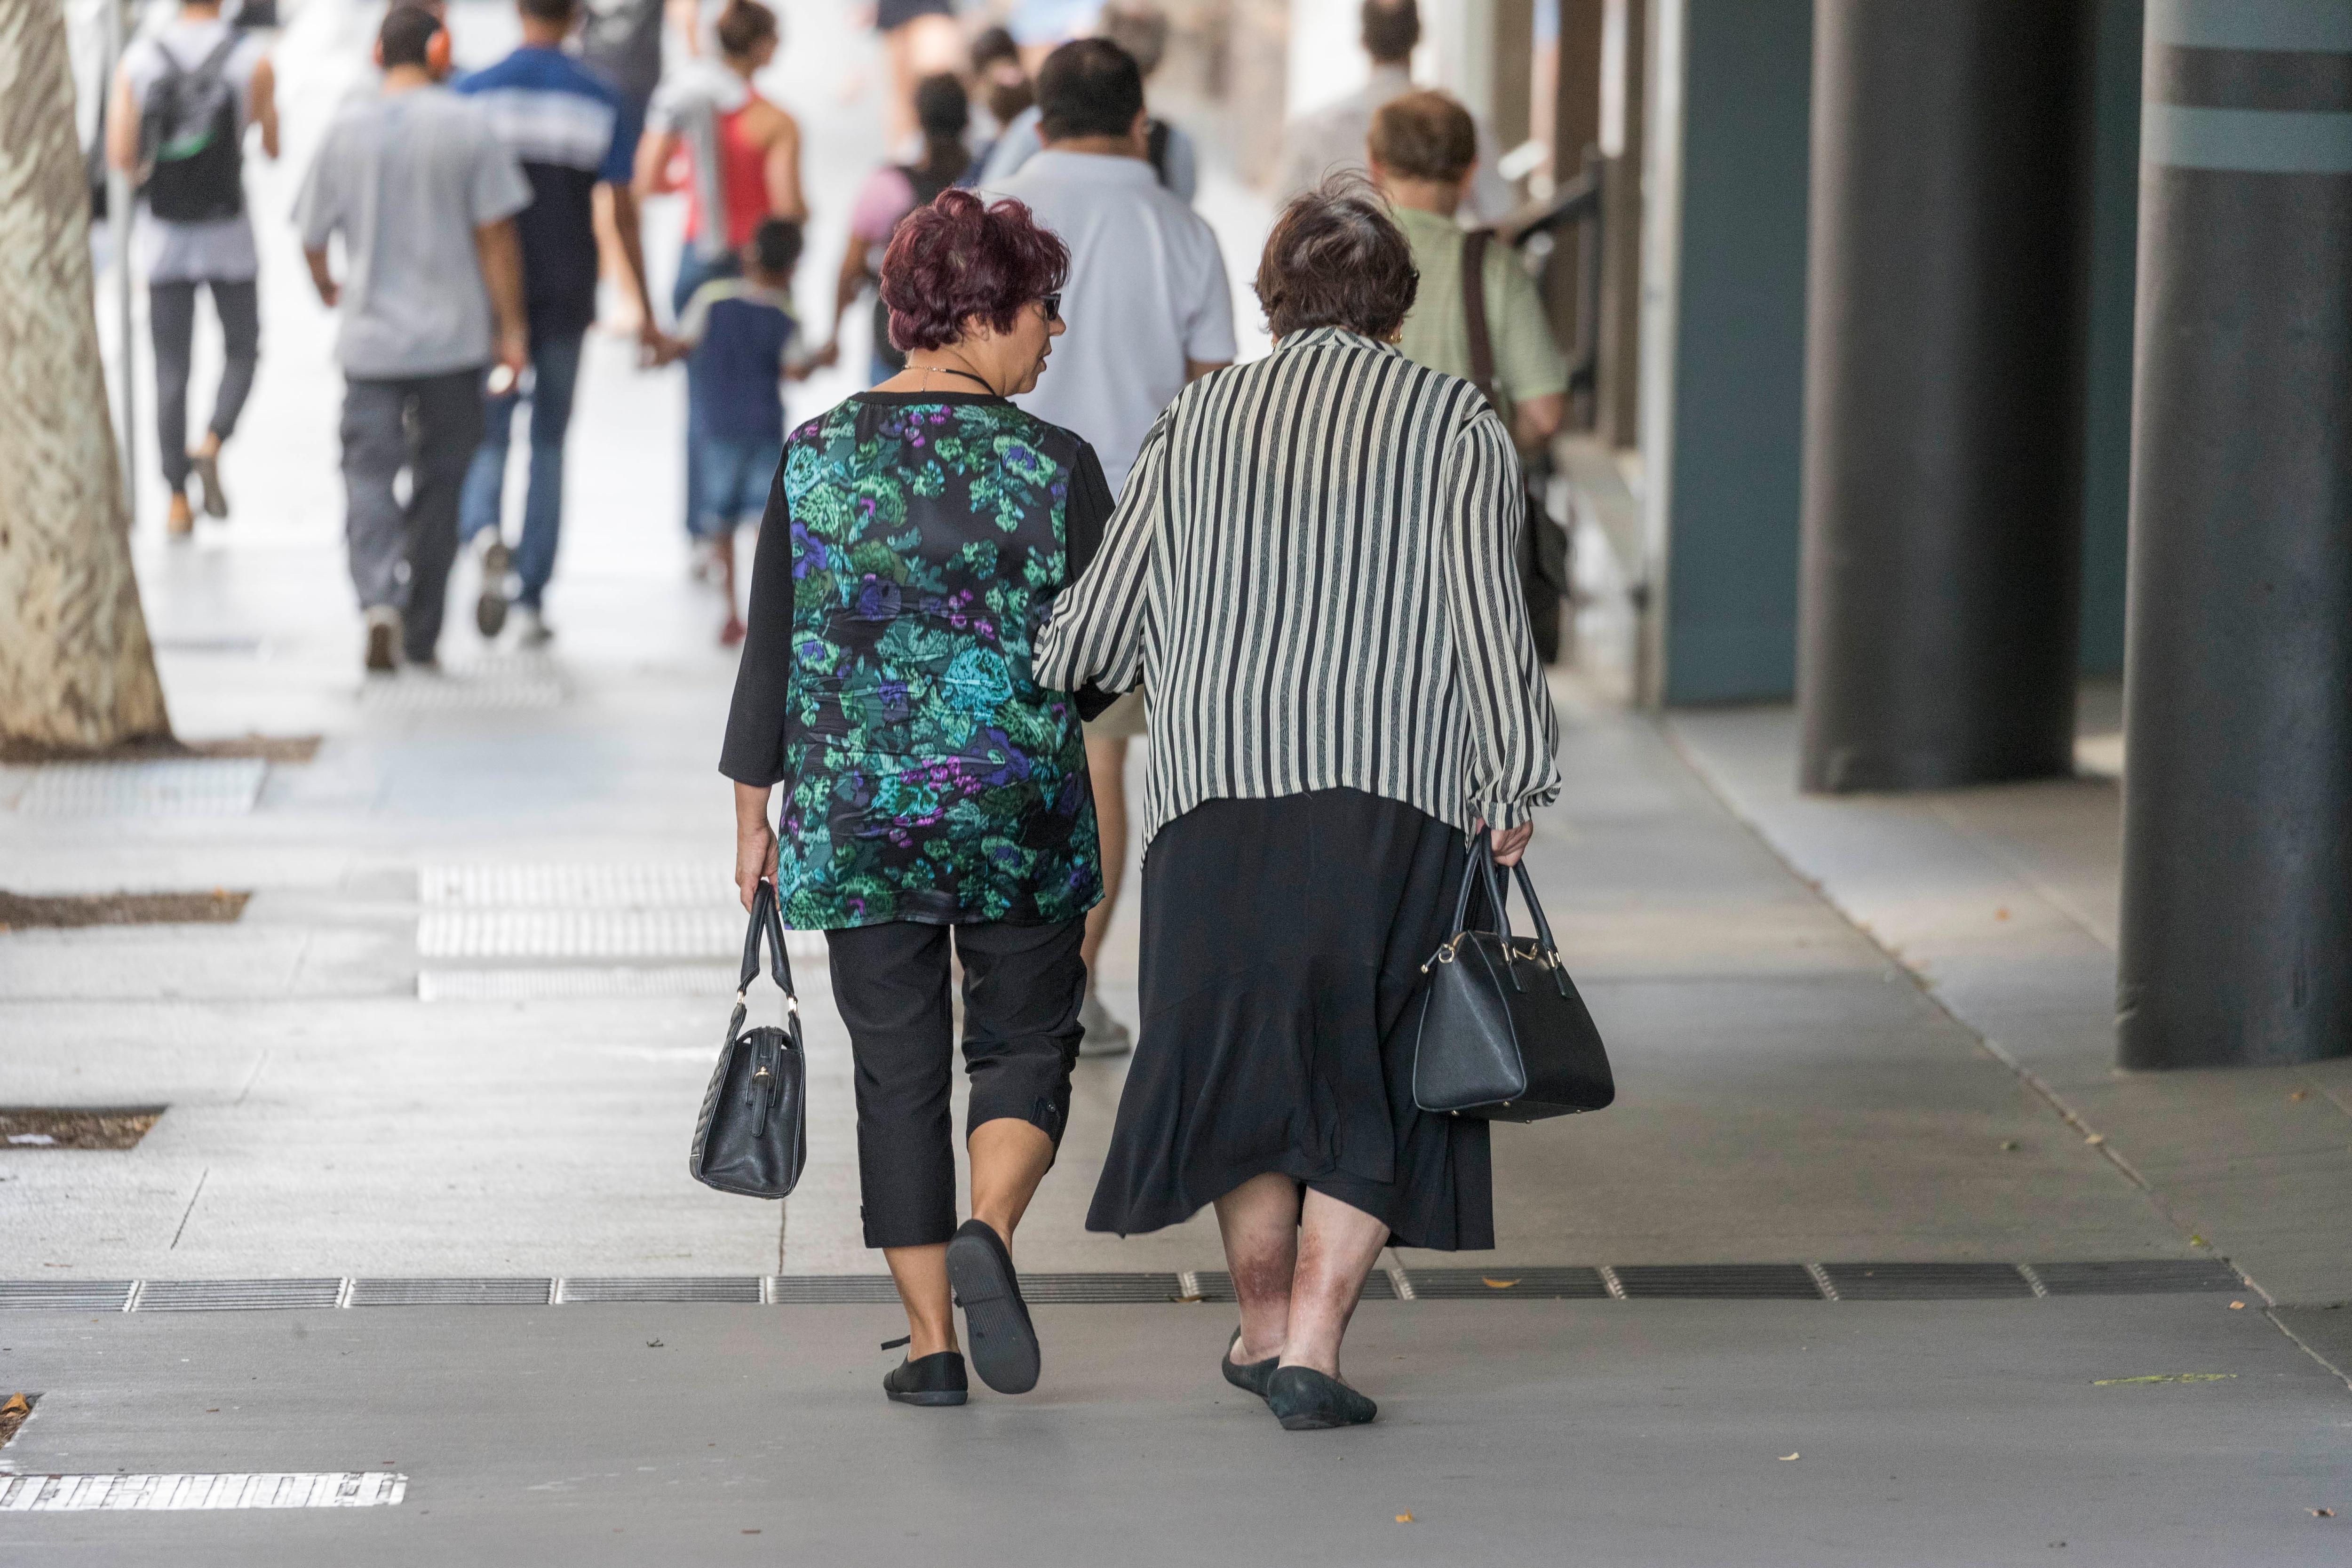 Elderly people walk in the street, in Brisbane, Saturday, May 5, 2018. (AAP Image/Glenn Hunt) NO ARCHIVING